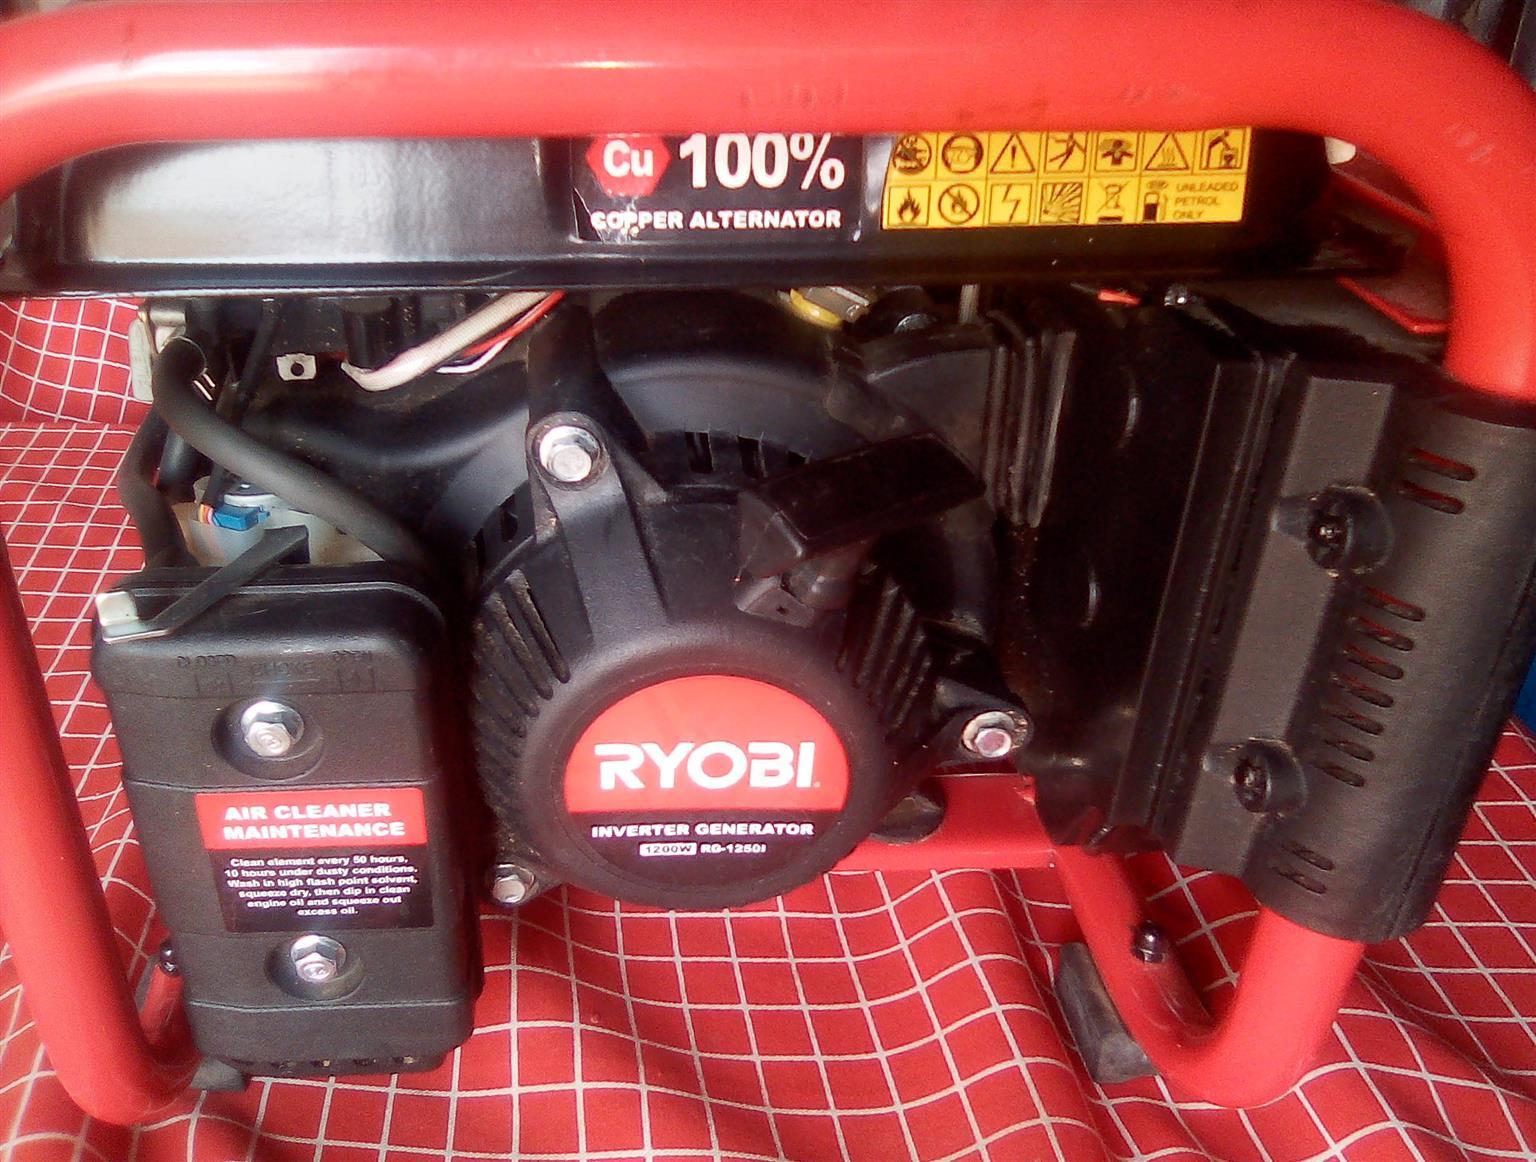 1200w Ryobi inverter generator